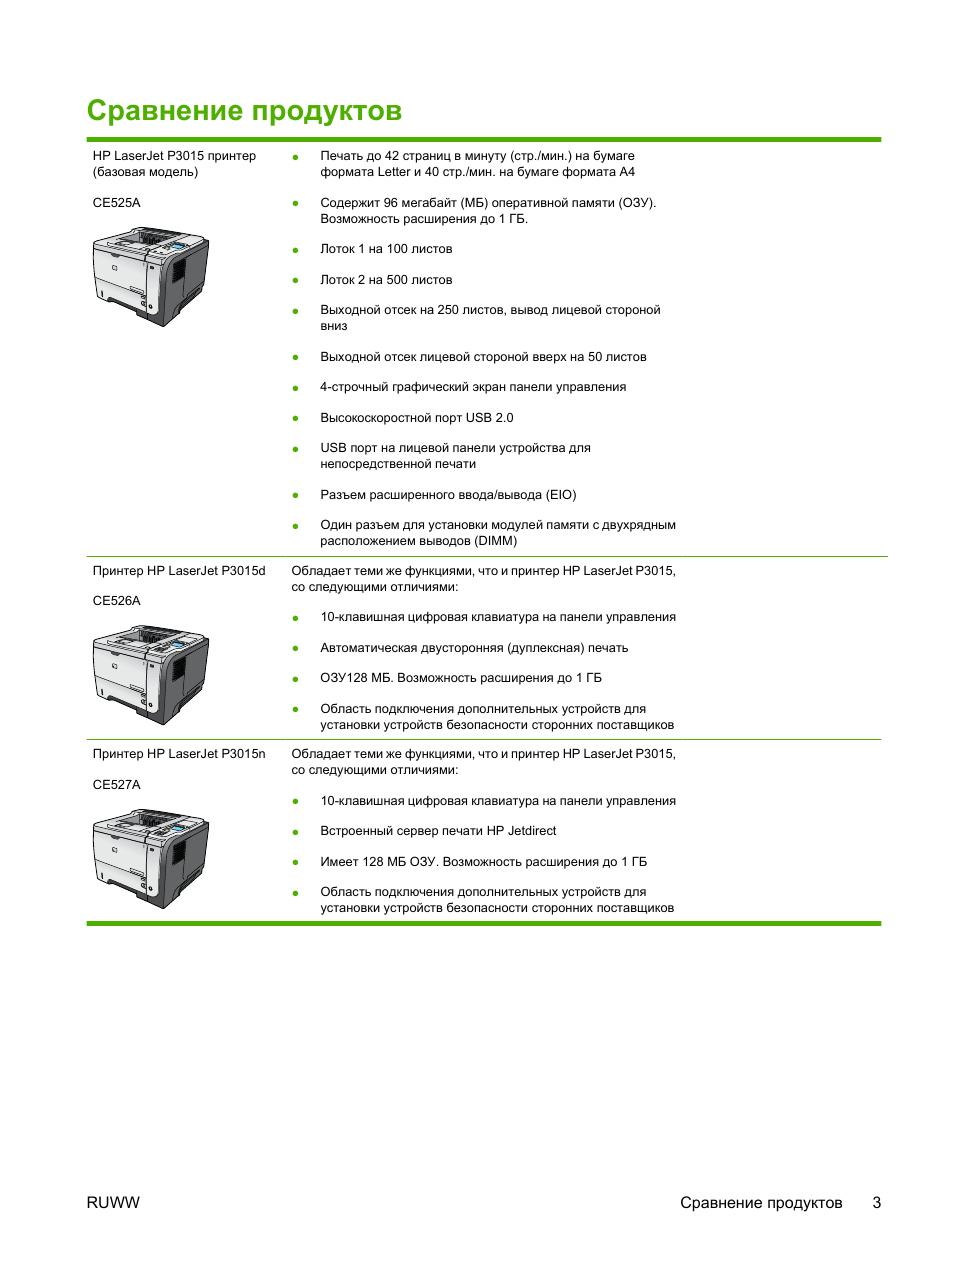 мфу hp laserjet 3015 инструкция на русском